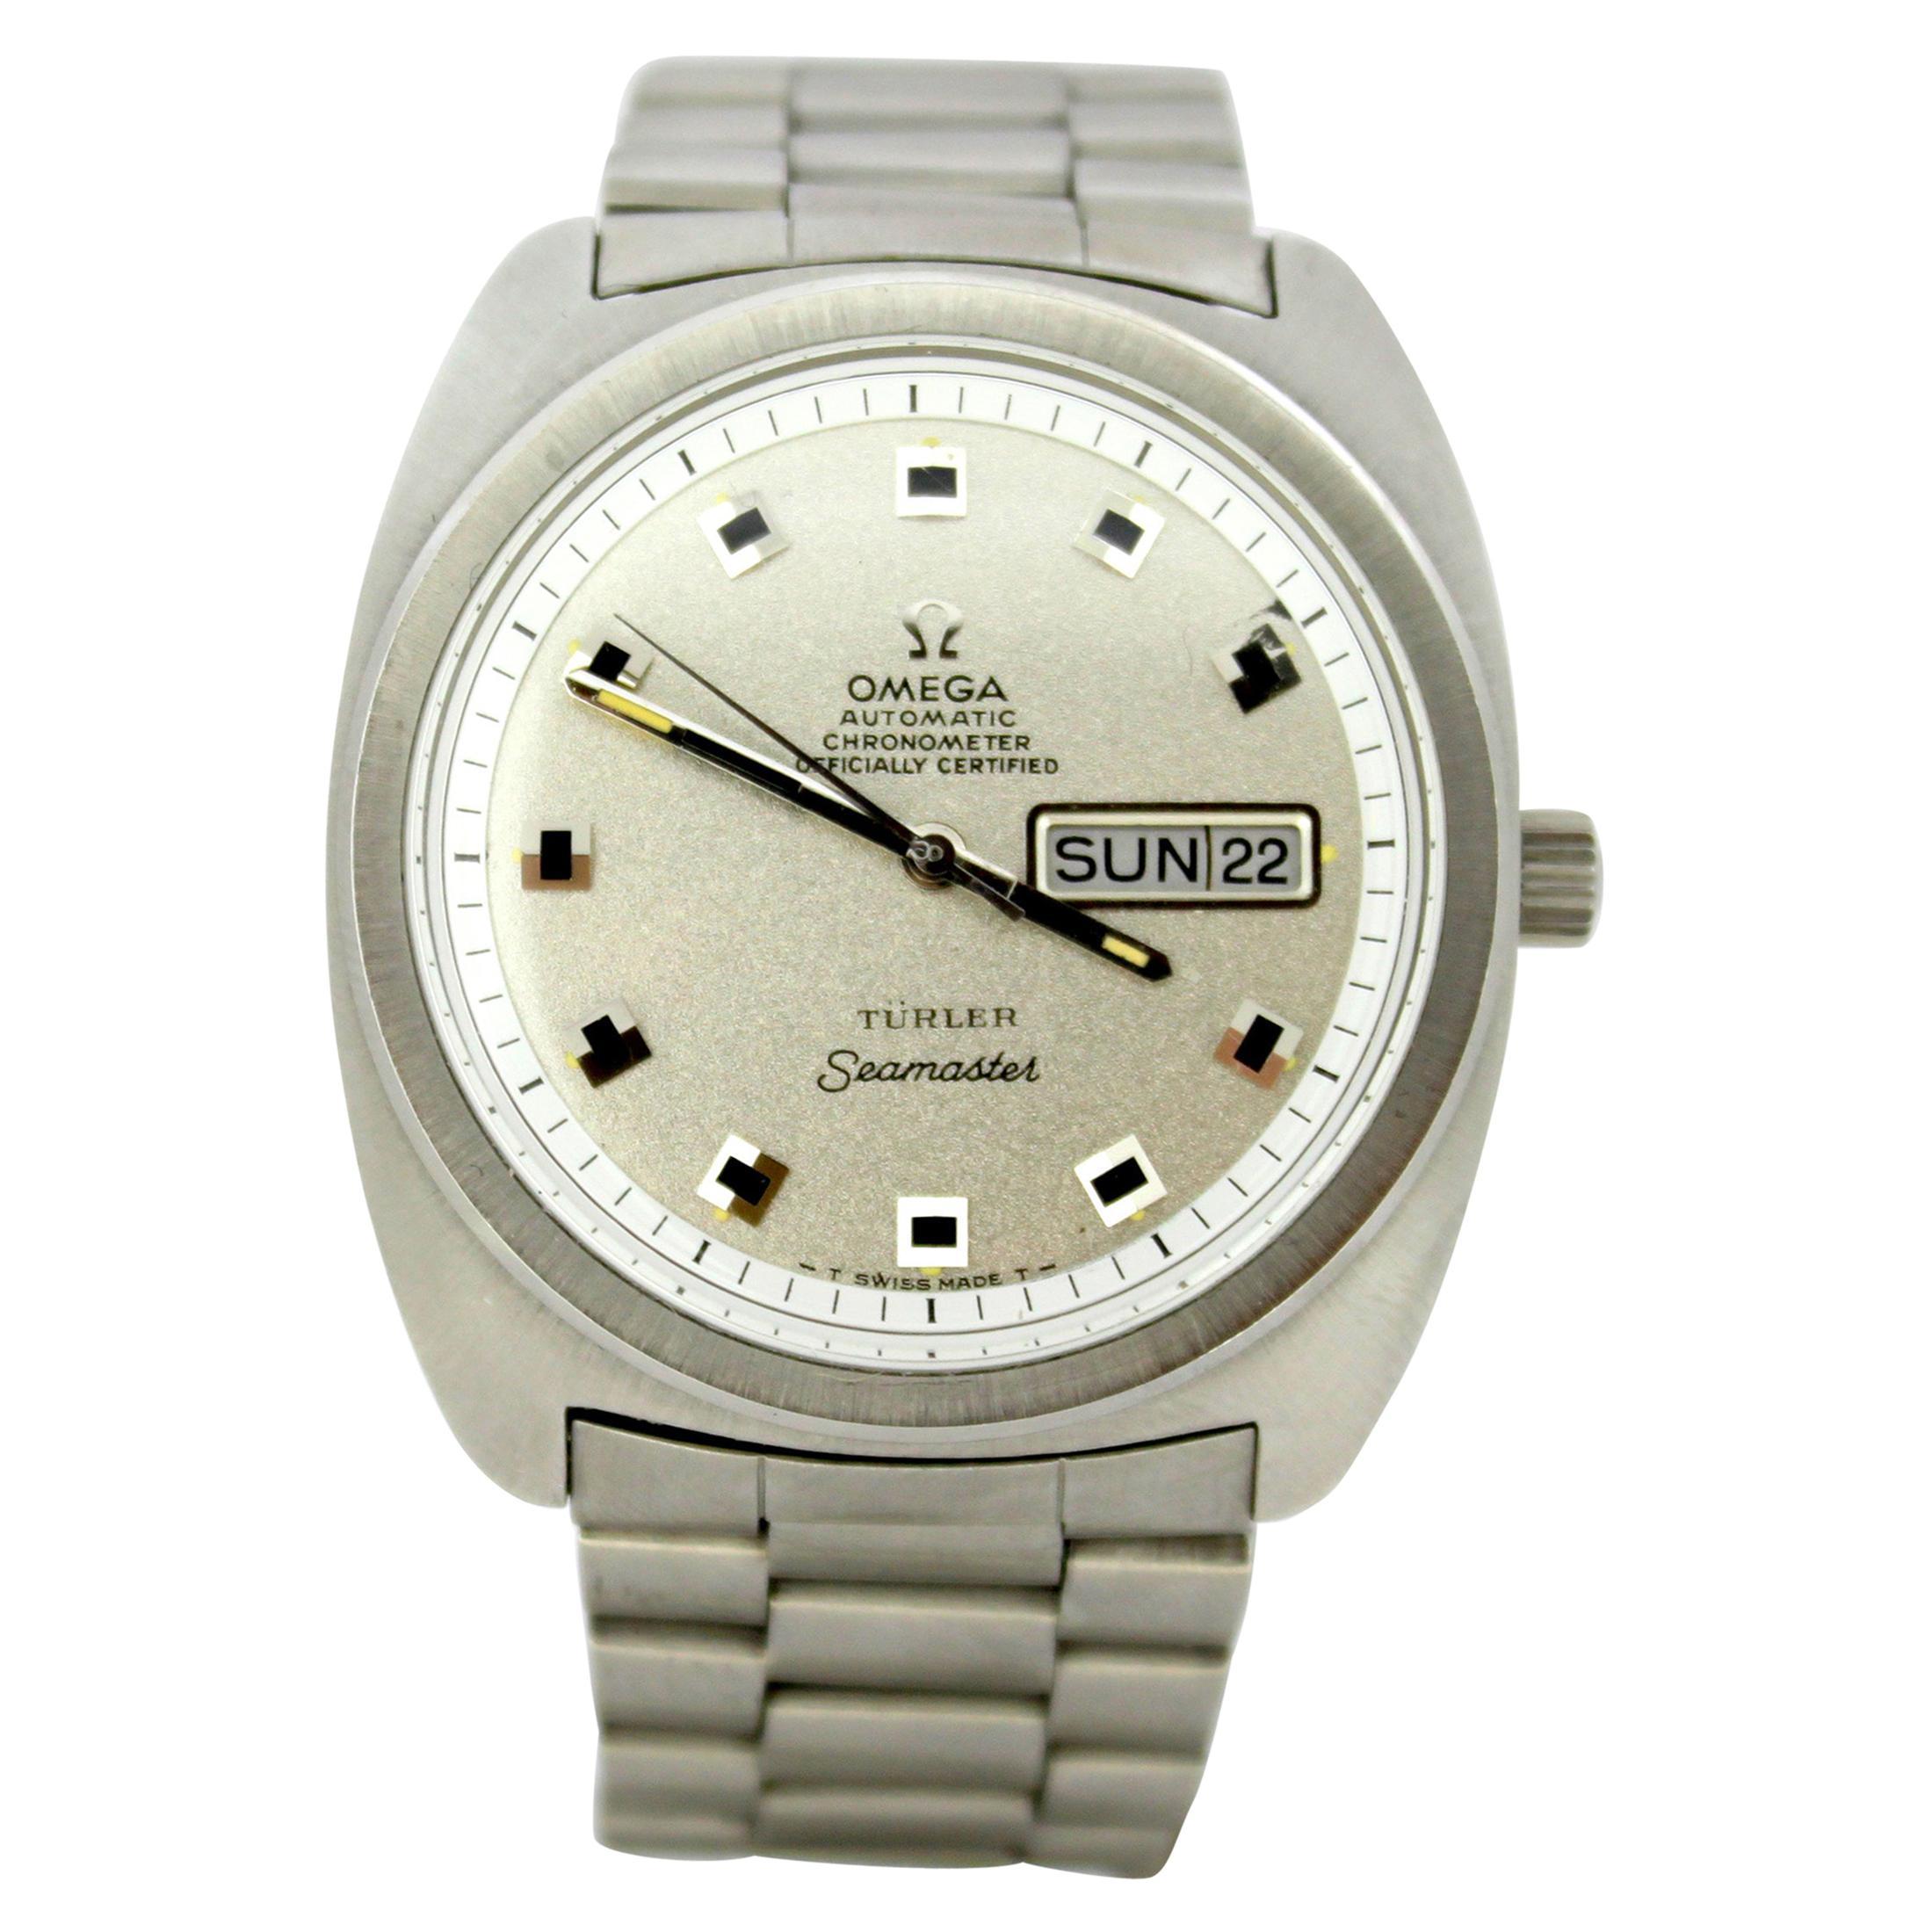 Omega Seamaster Turler, Men's Automatic Steel Wristwatch circa 1967